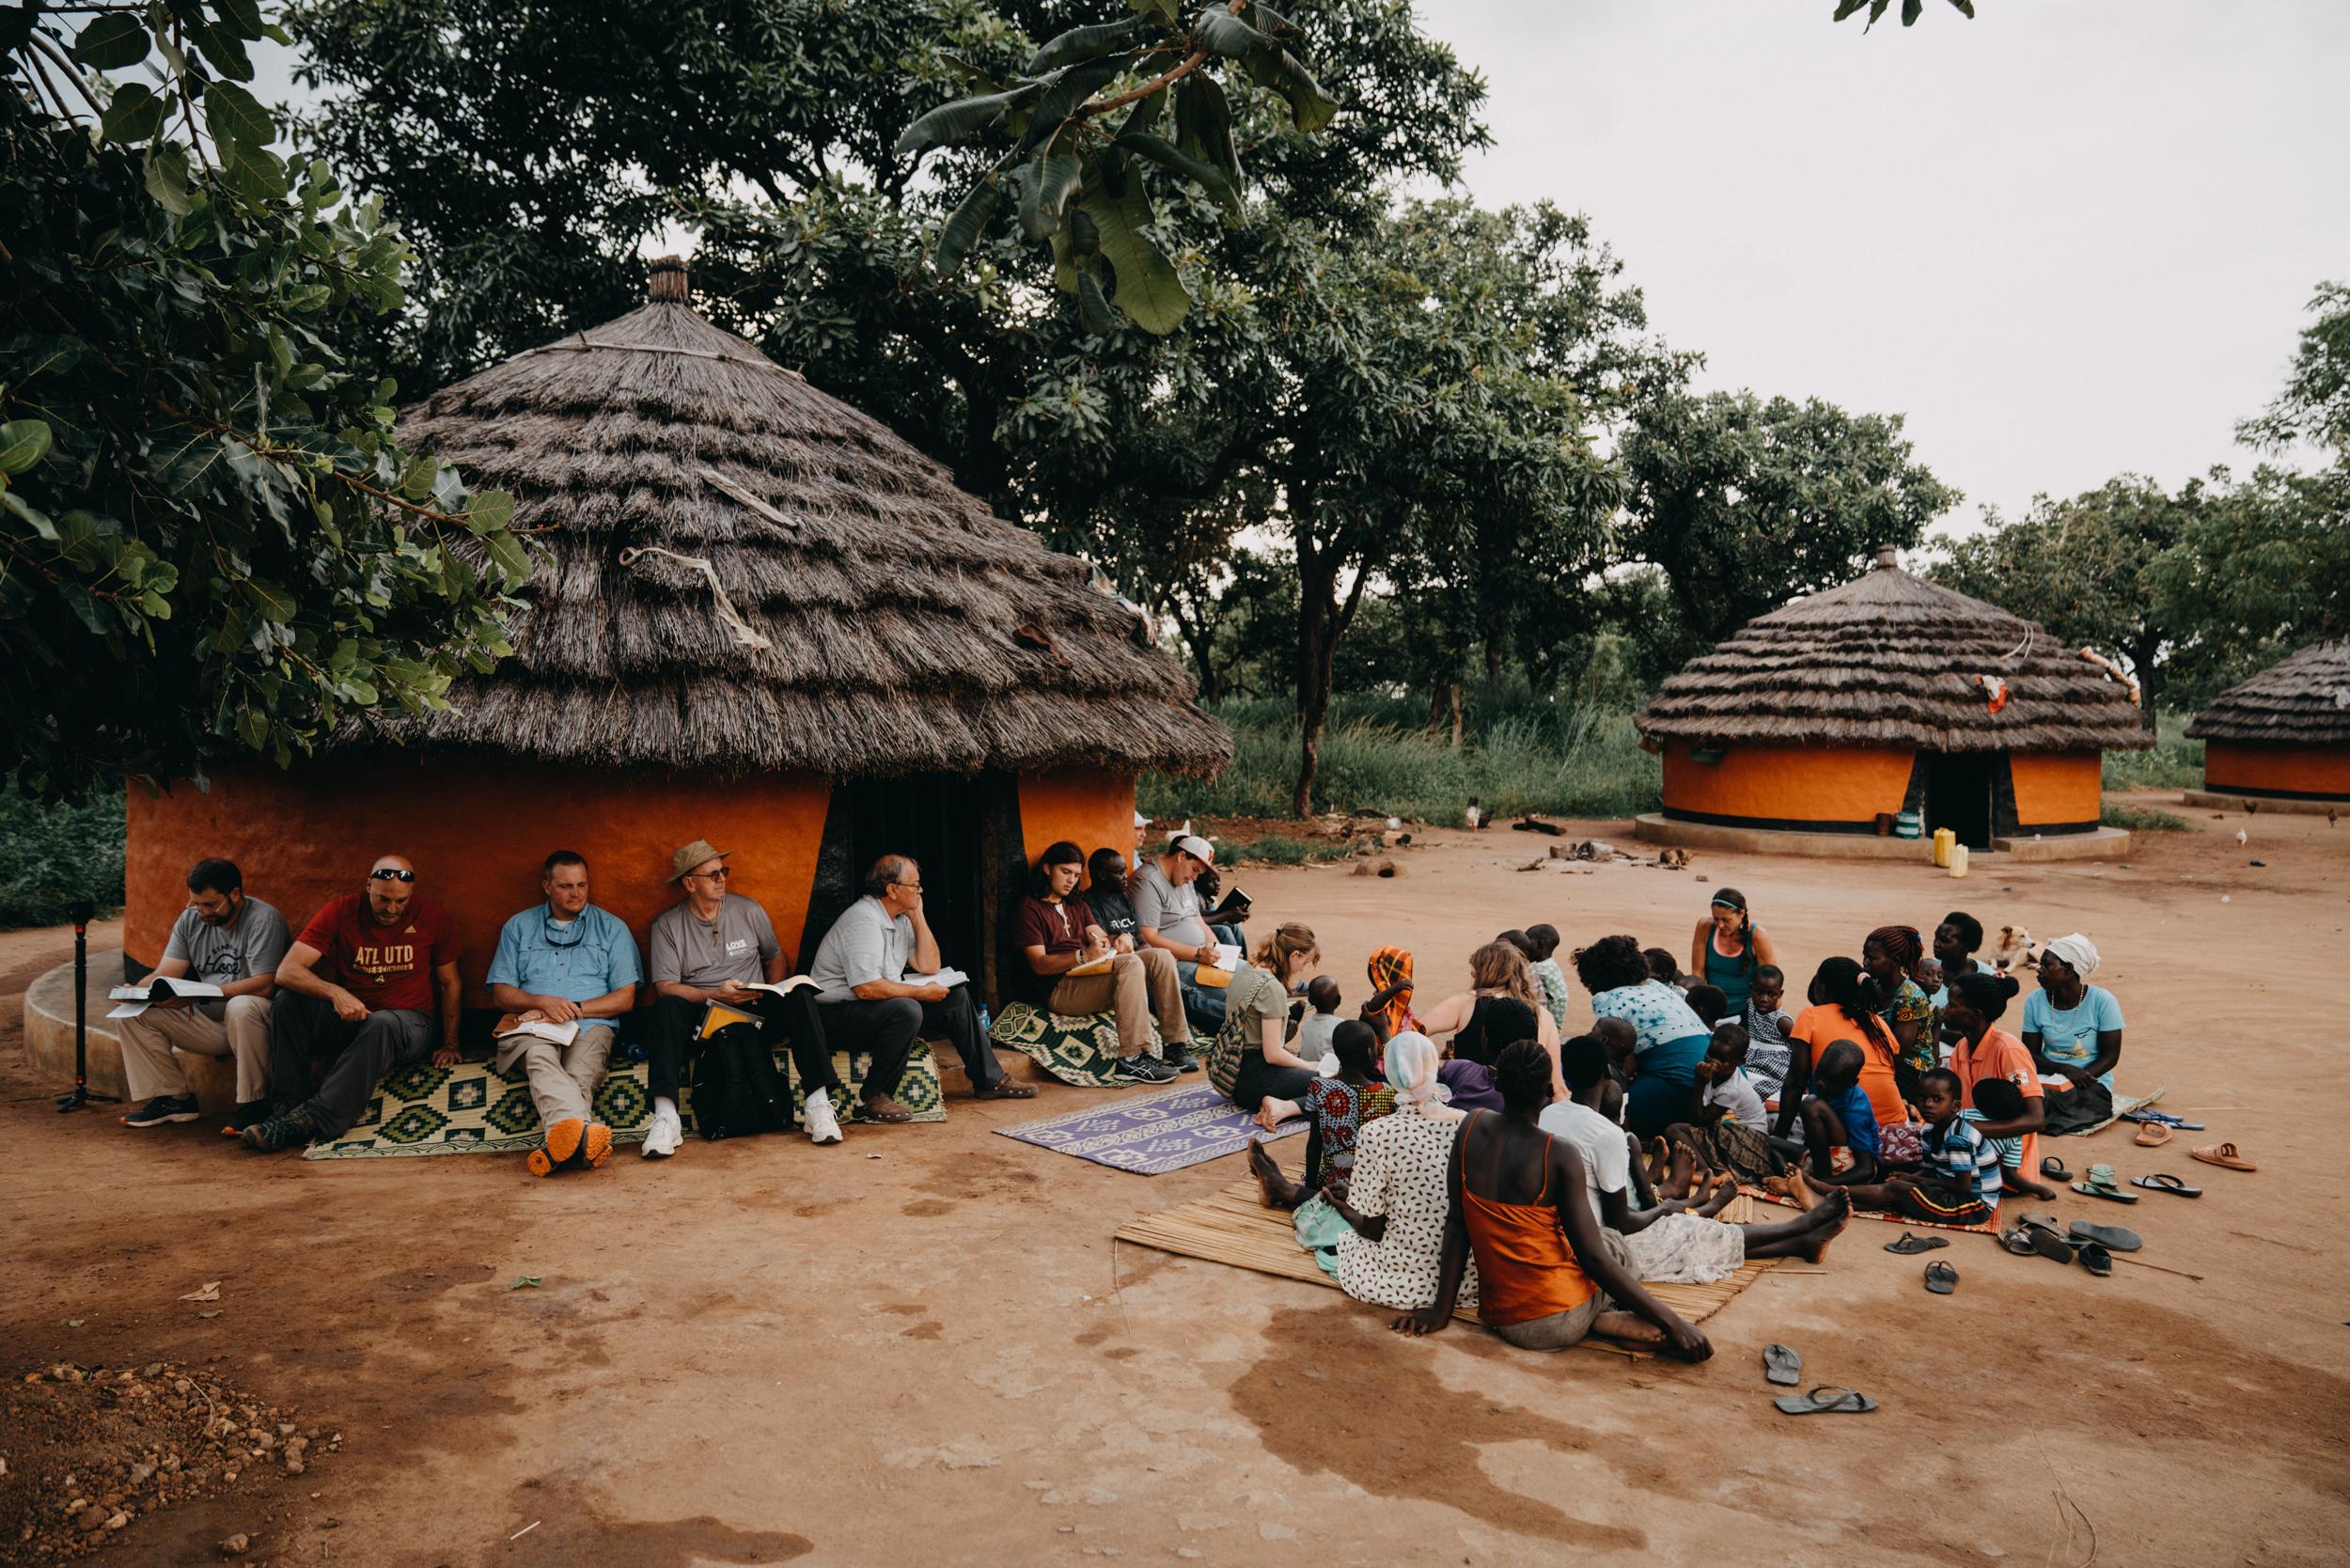 uganda july 2018-8.jpg